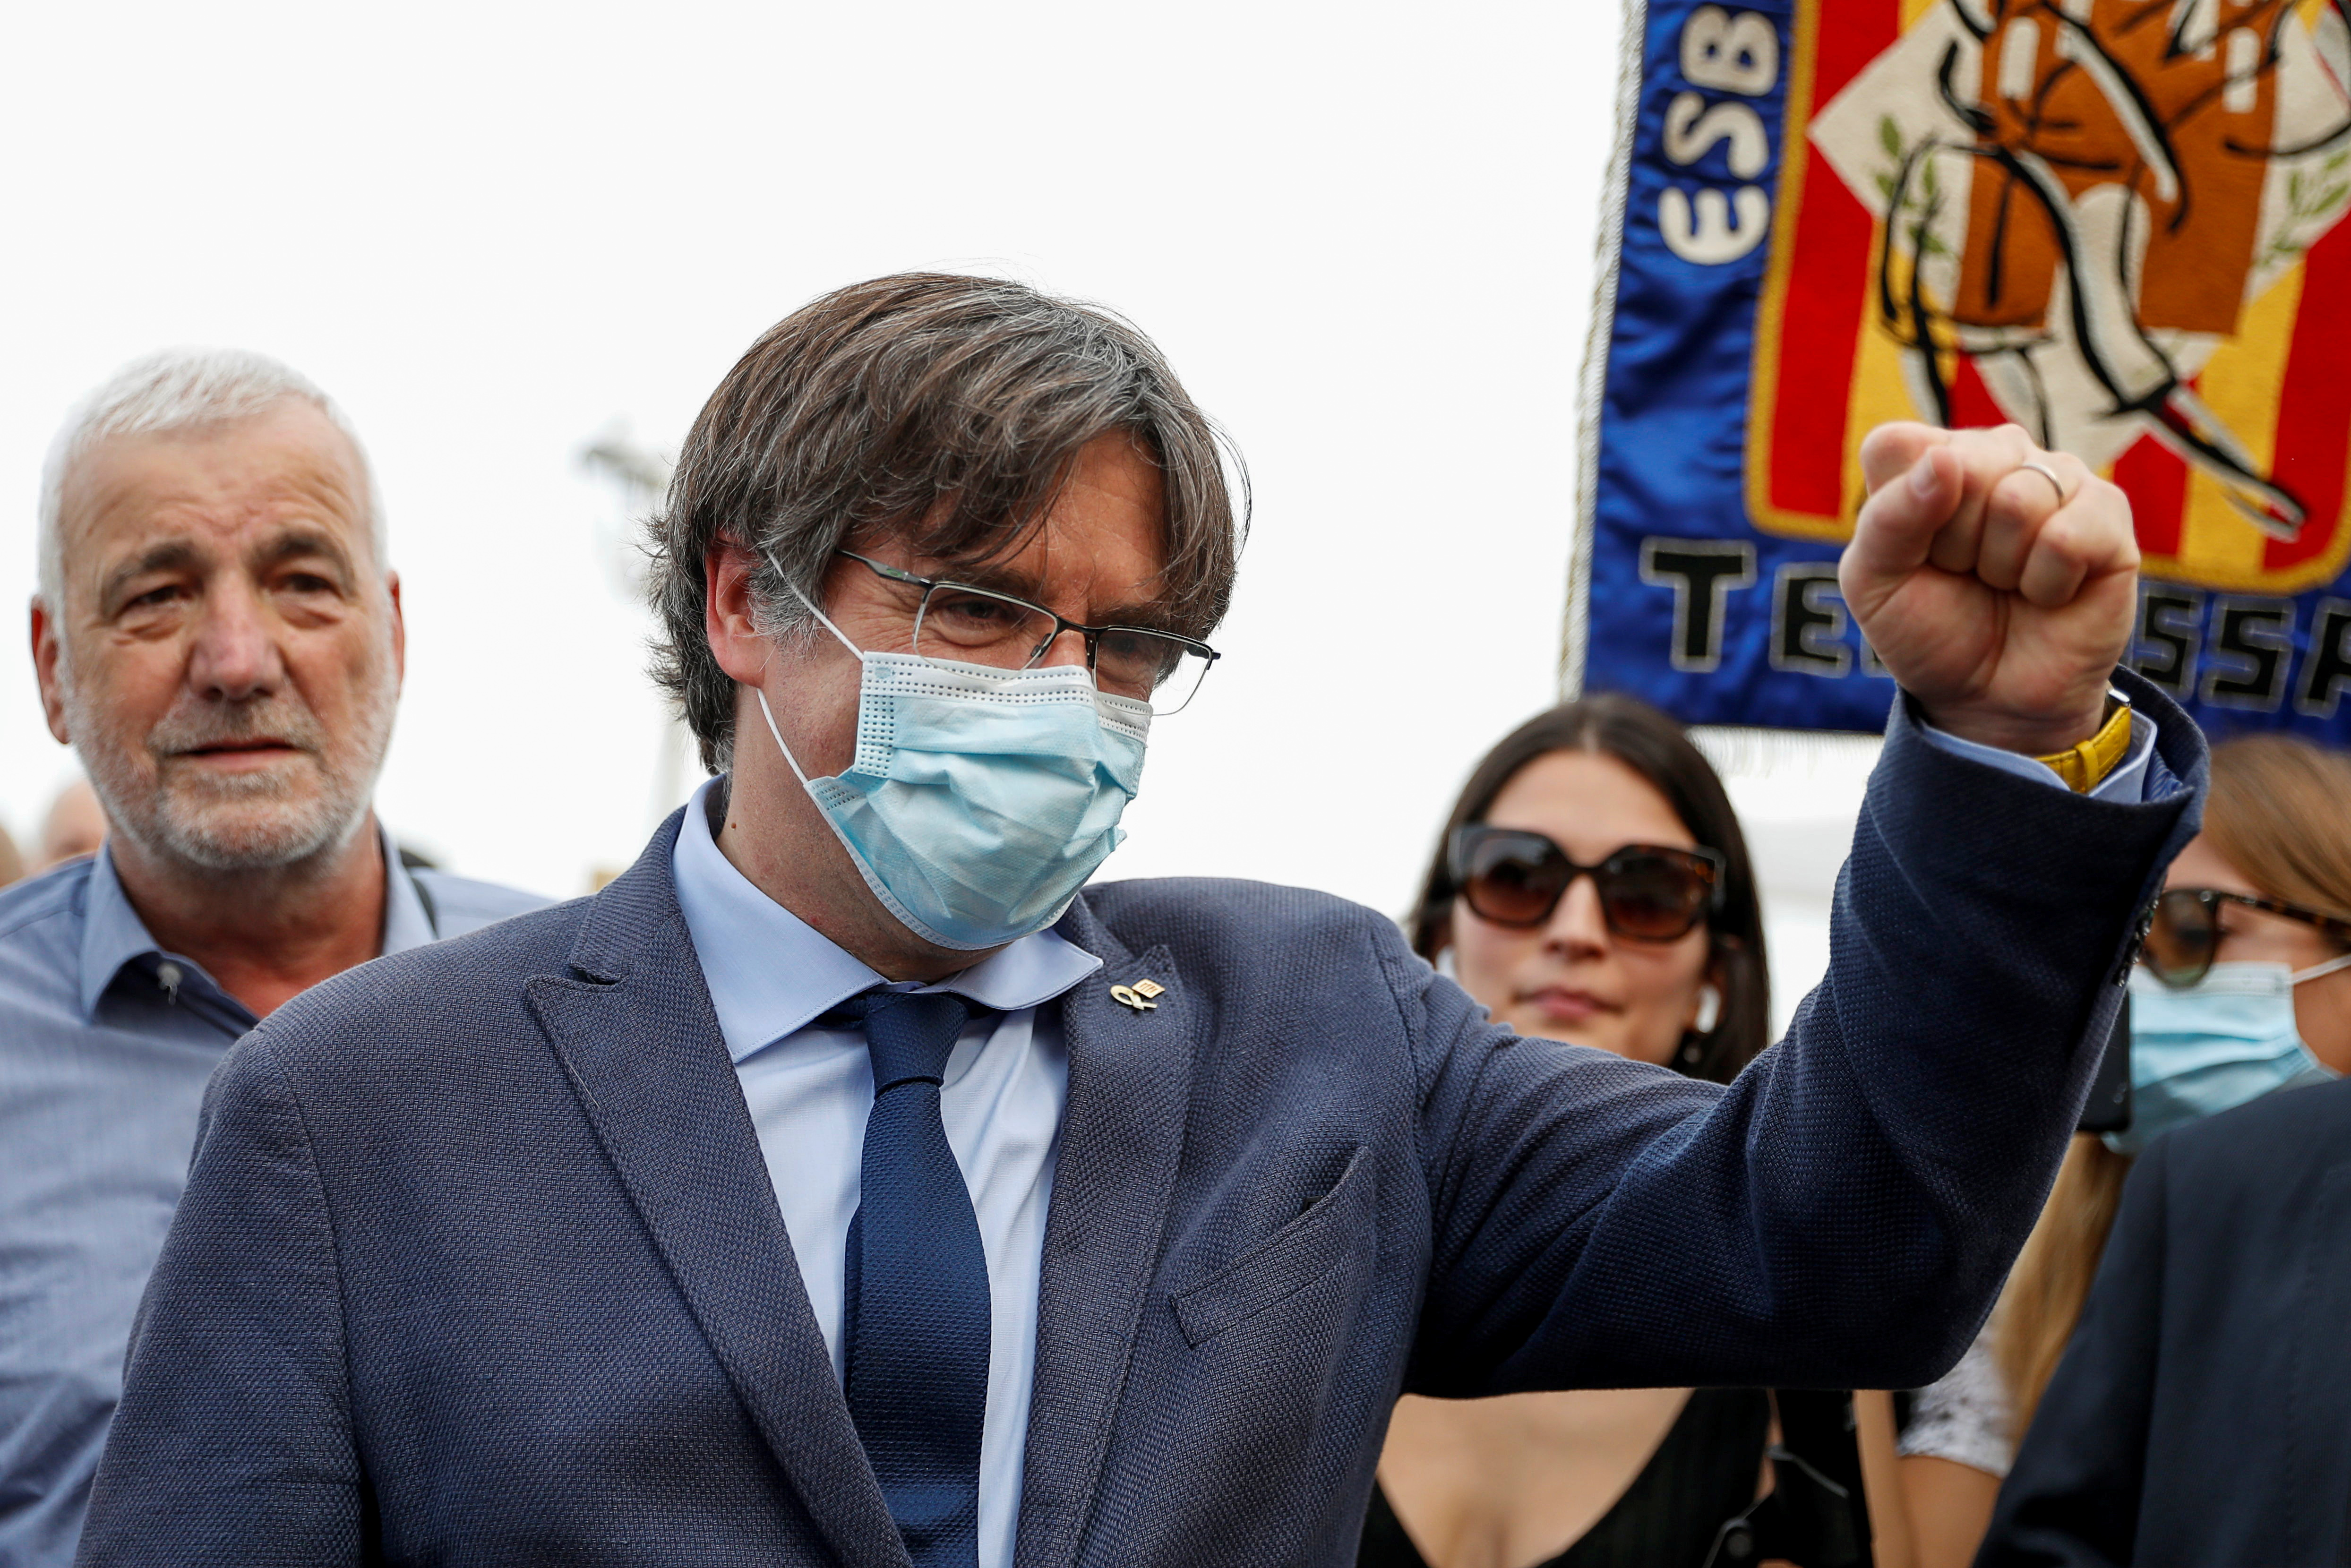 Former Catalan government head Carles Puigdemont gestures as he walks in Alghero, Italy, September 25, 2021. REUTERS/Yara Nardi